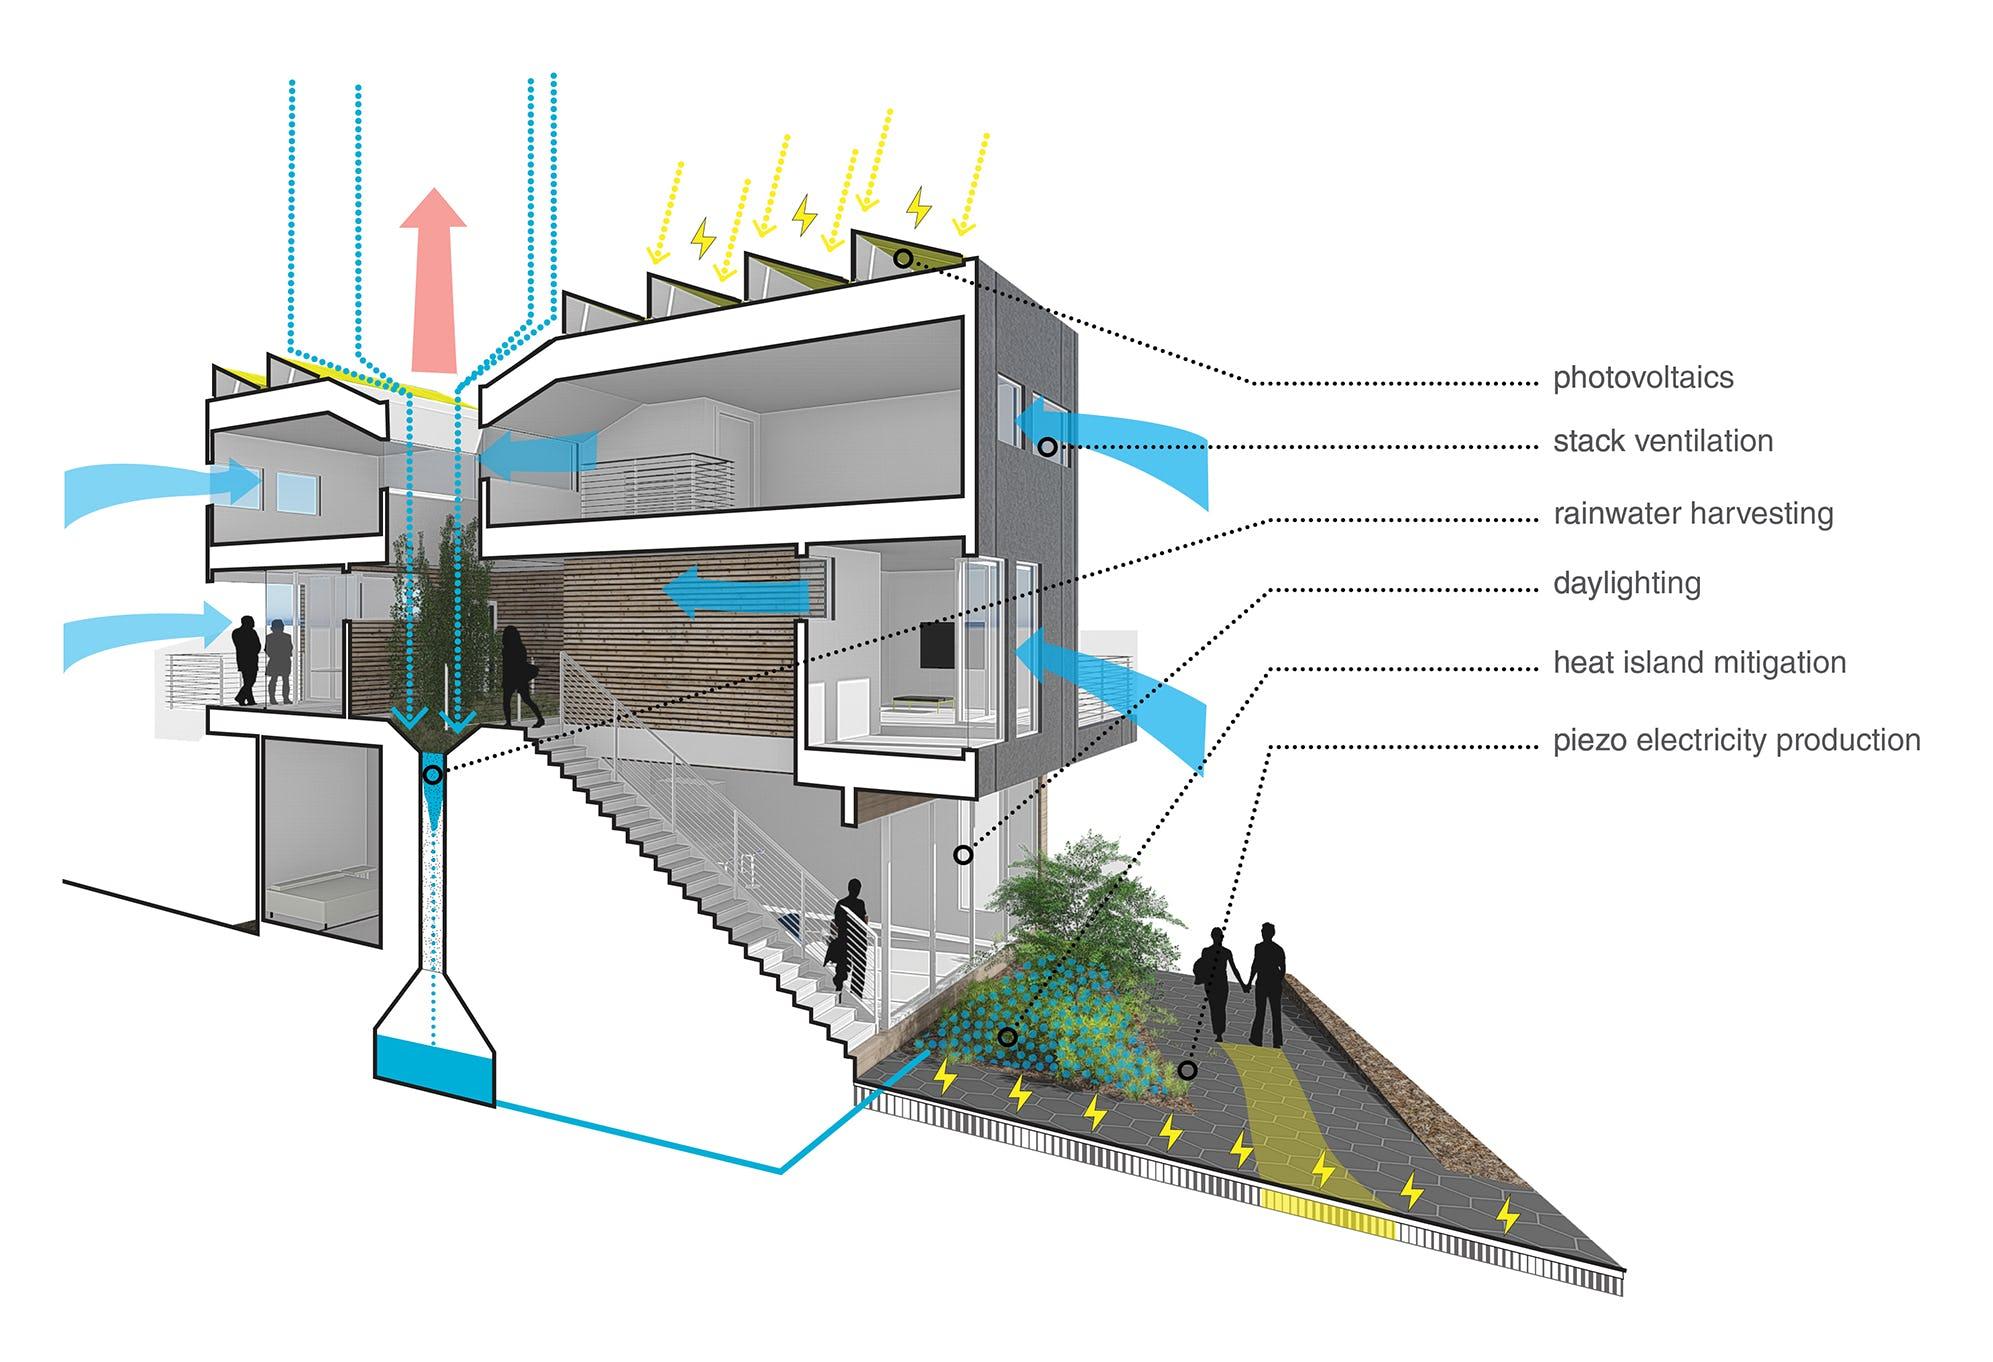 Piezein circuit townhouse diagram web